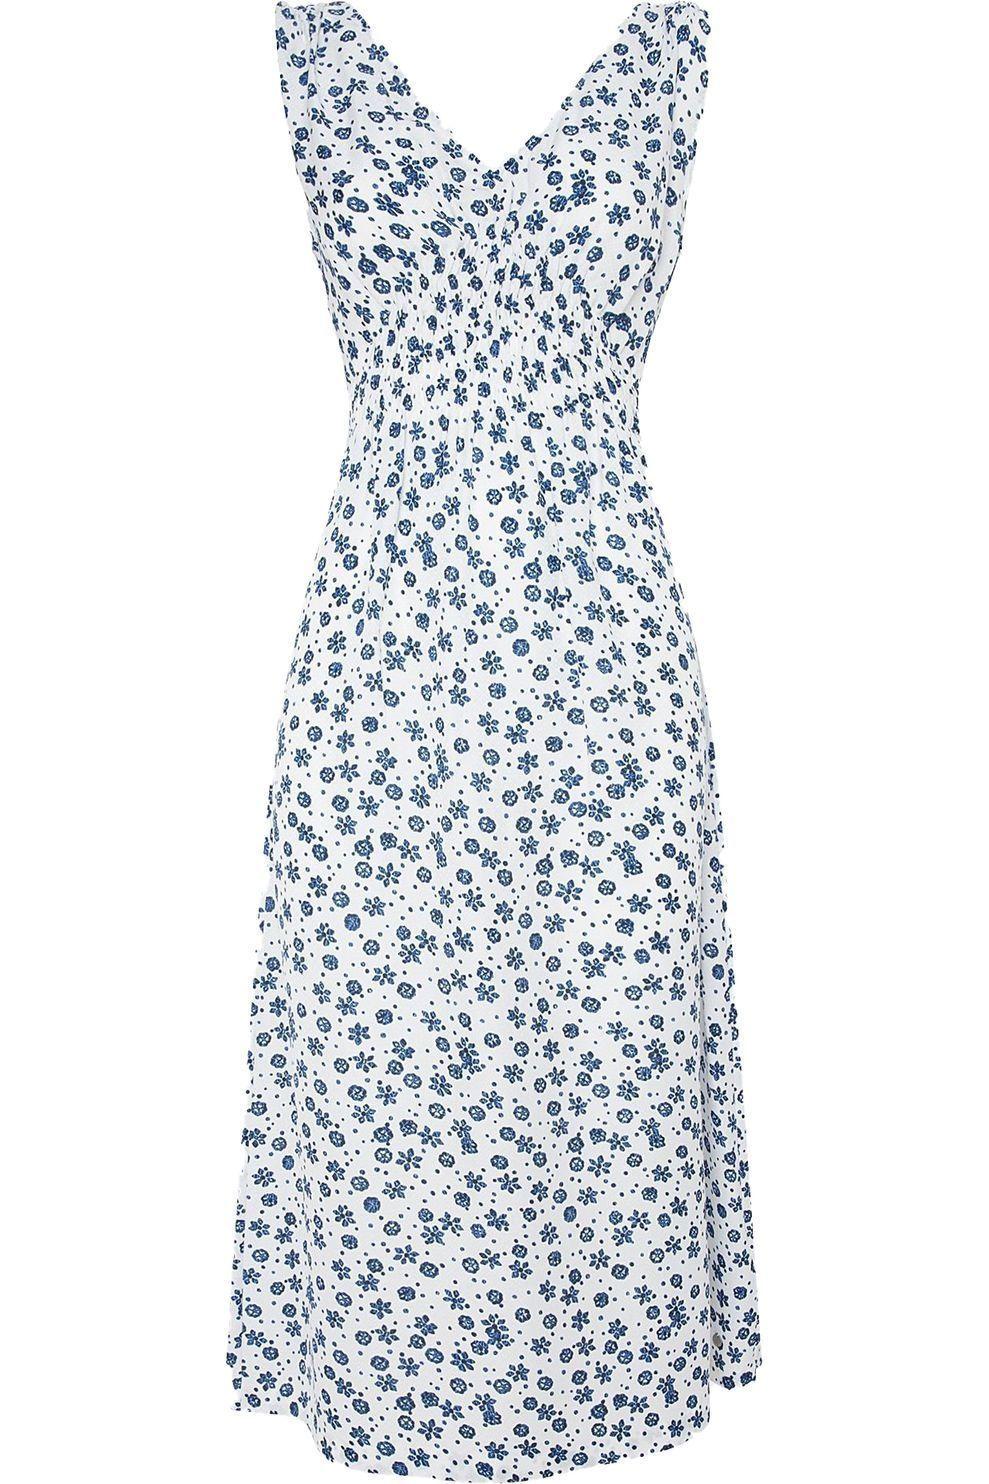 Pepe Jeans Jurk Lou voor dames - Wit/Blauw - Maten: XS, S, M, L, XL